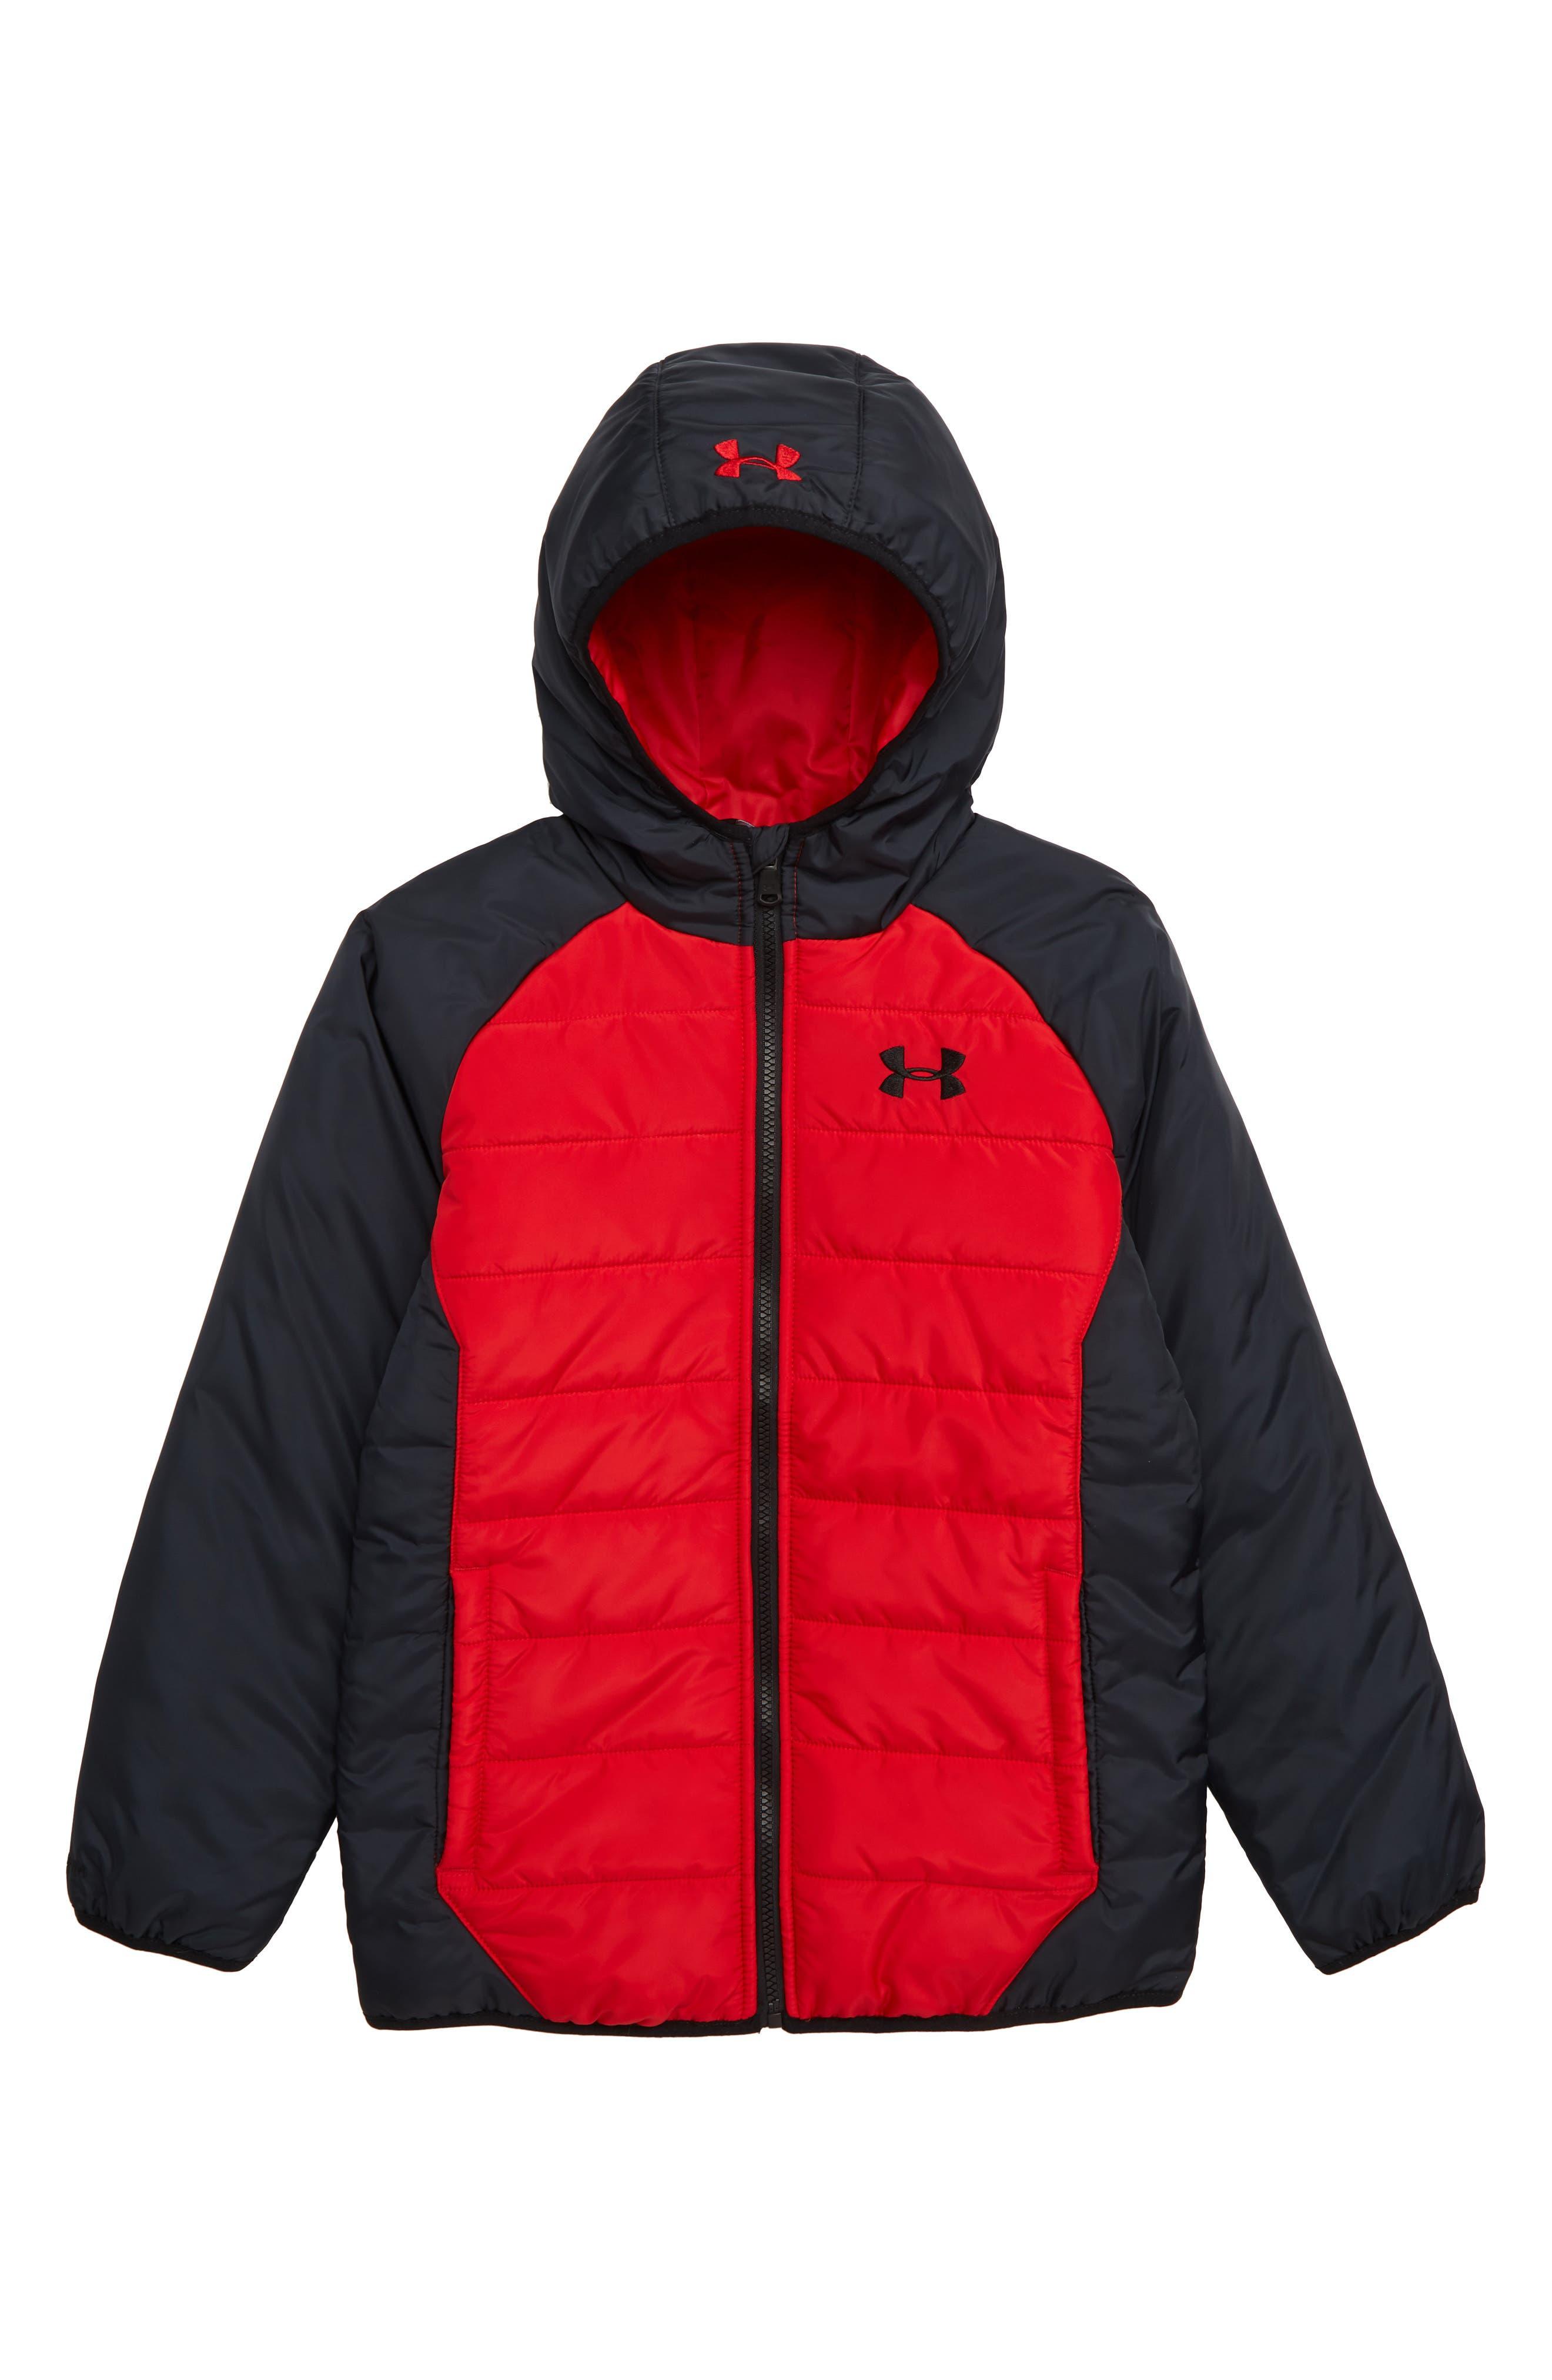 Boys Under Armour Tuckerman Water Repellent Coldgear Jacket